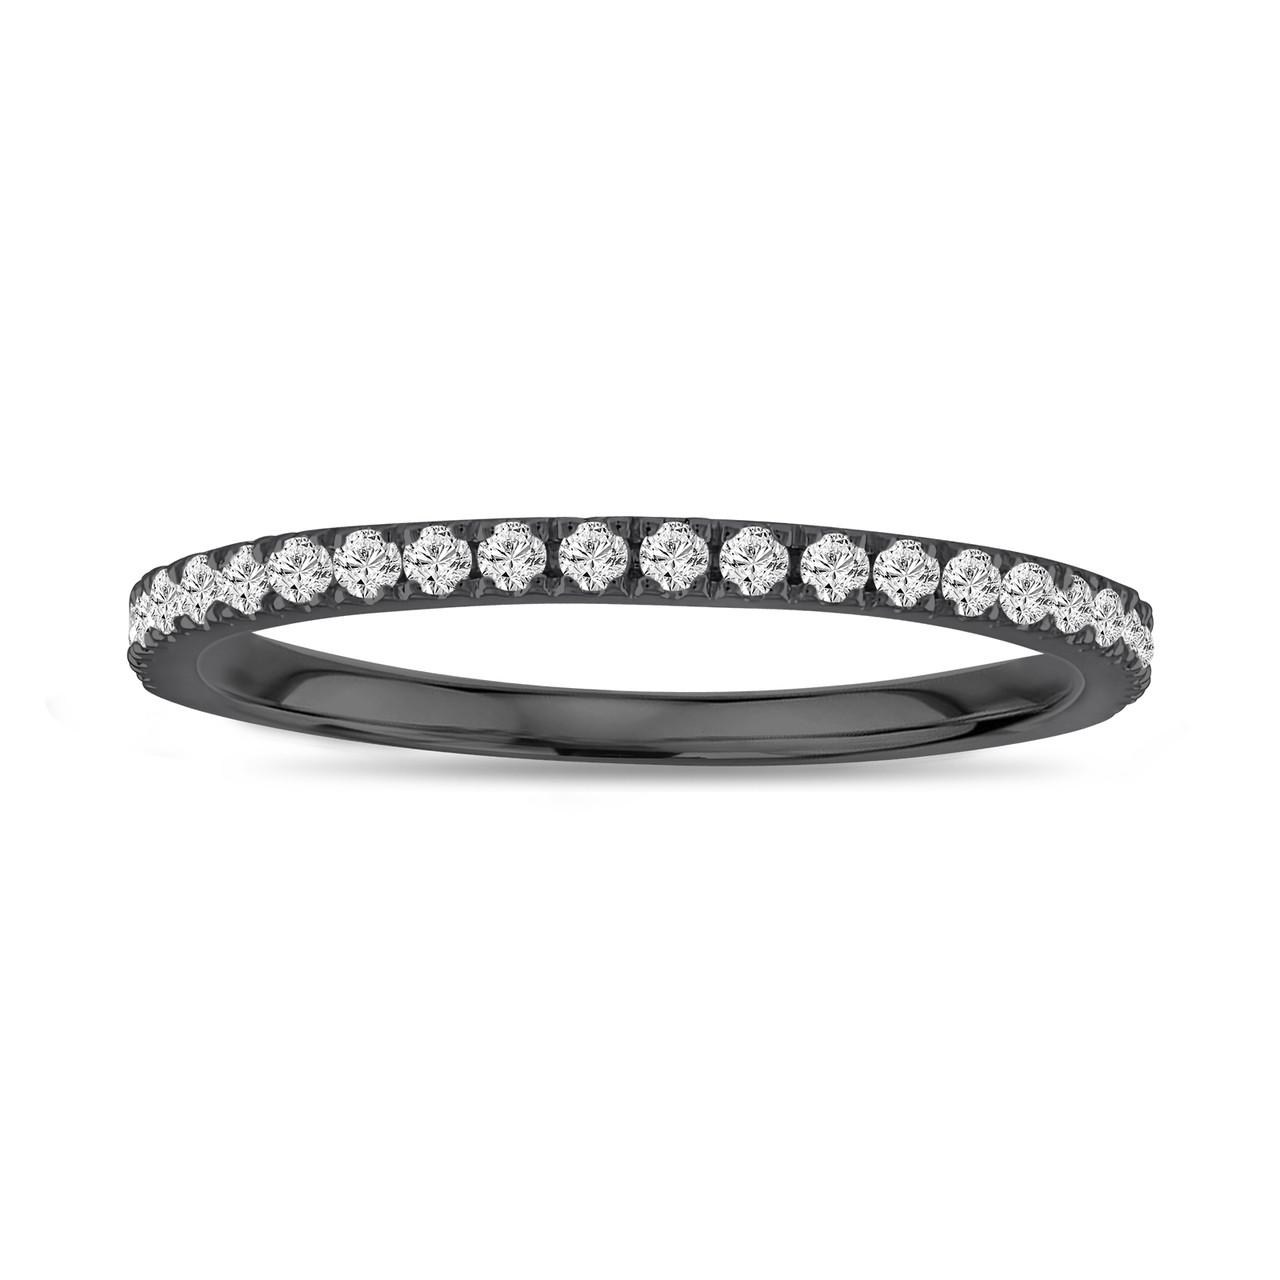 f3e6568cd2e48 Vintage Style Diamond Wedding Band, Thin Wedding Ring, 14K Black Gold Half  Eternity Band, Anniversary Ring, 0.25 Carat handmade Pave